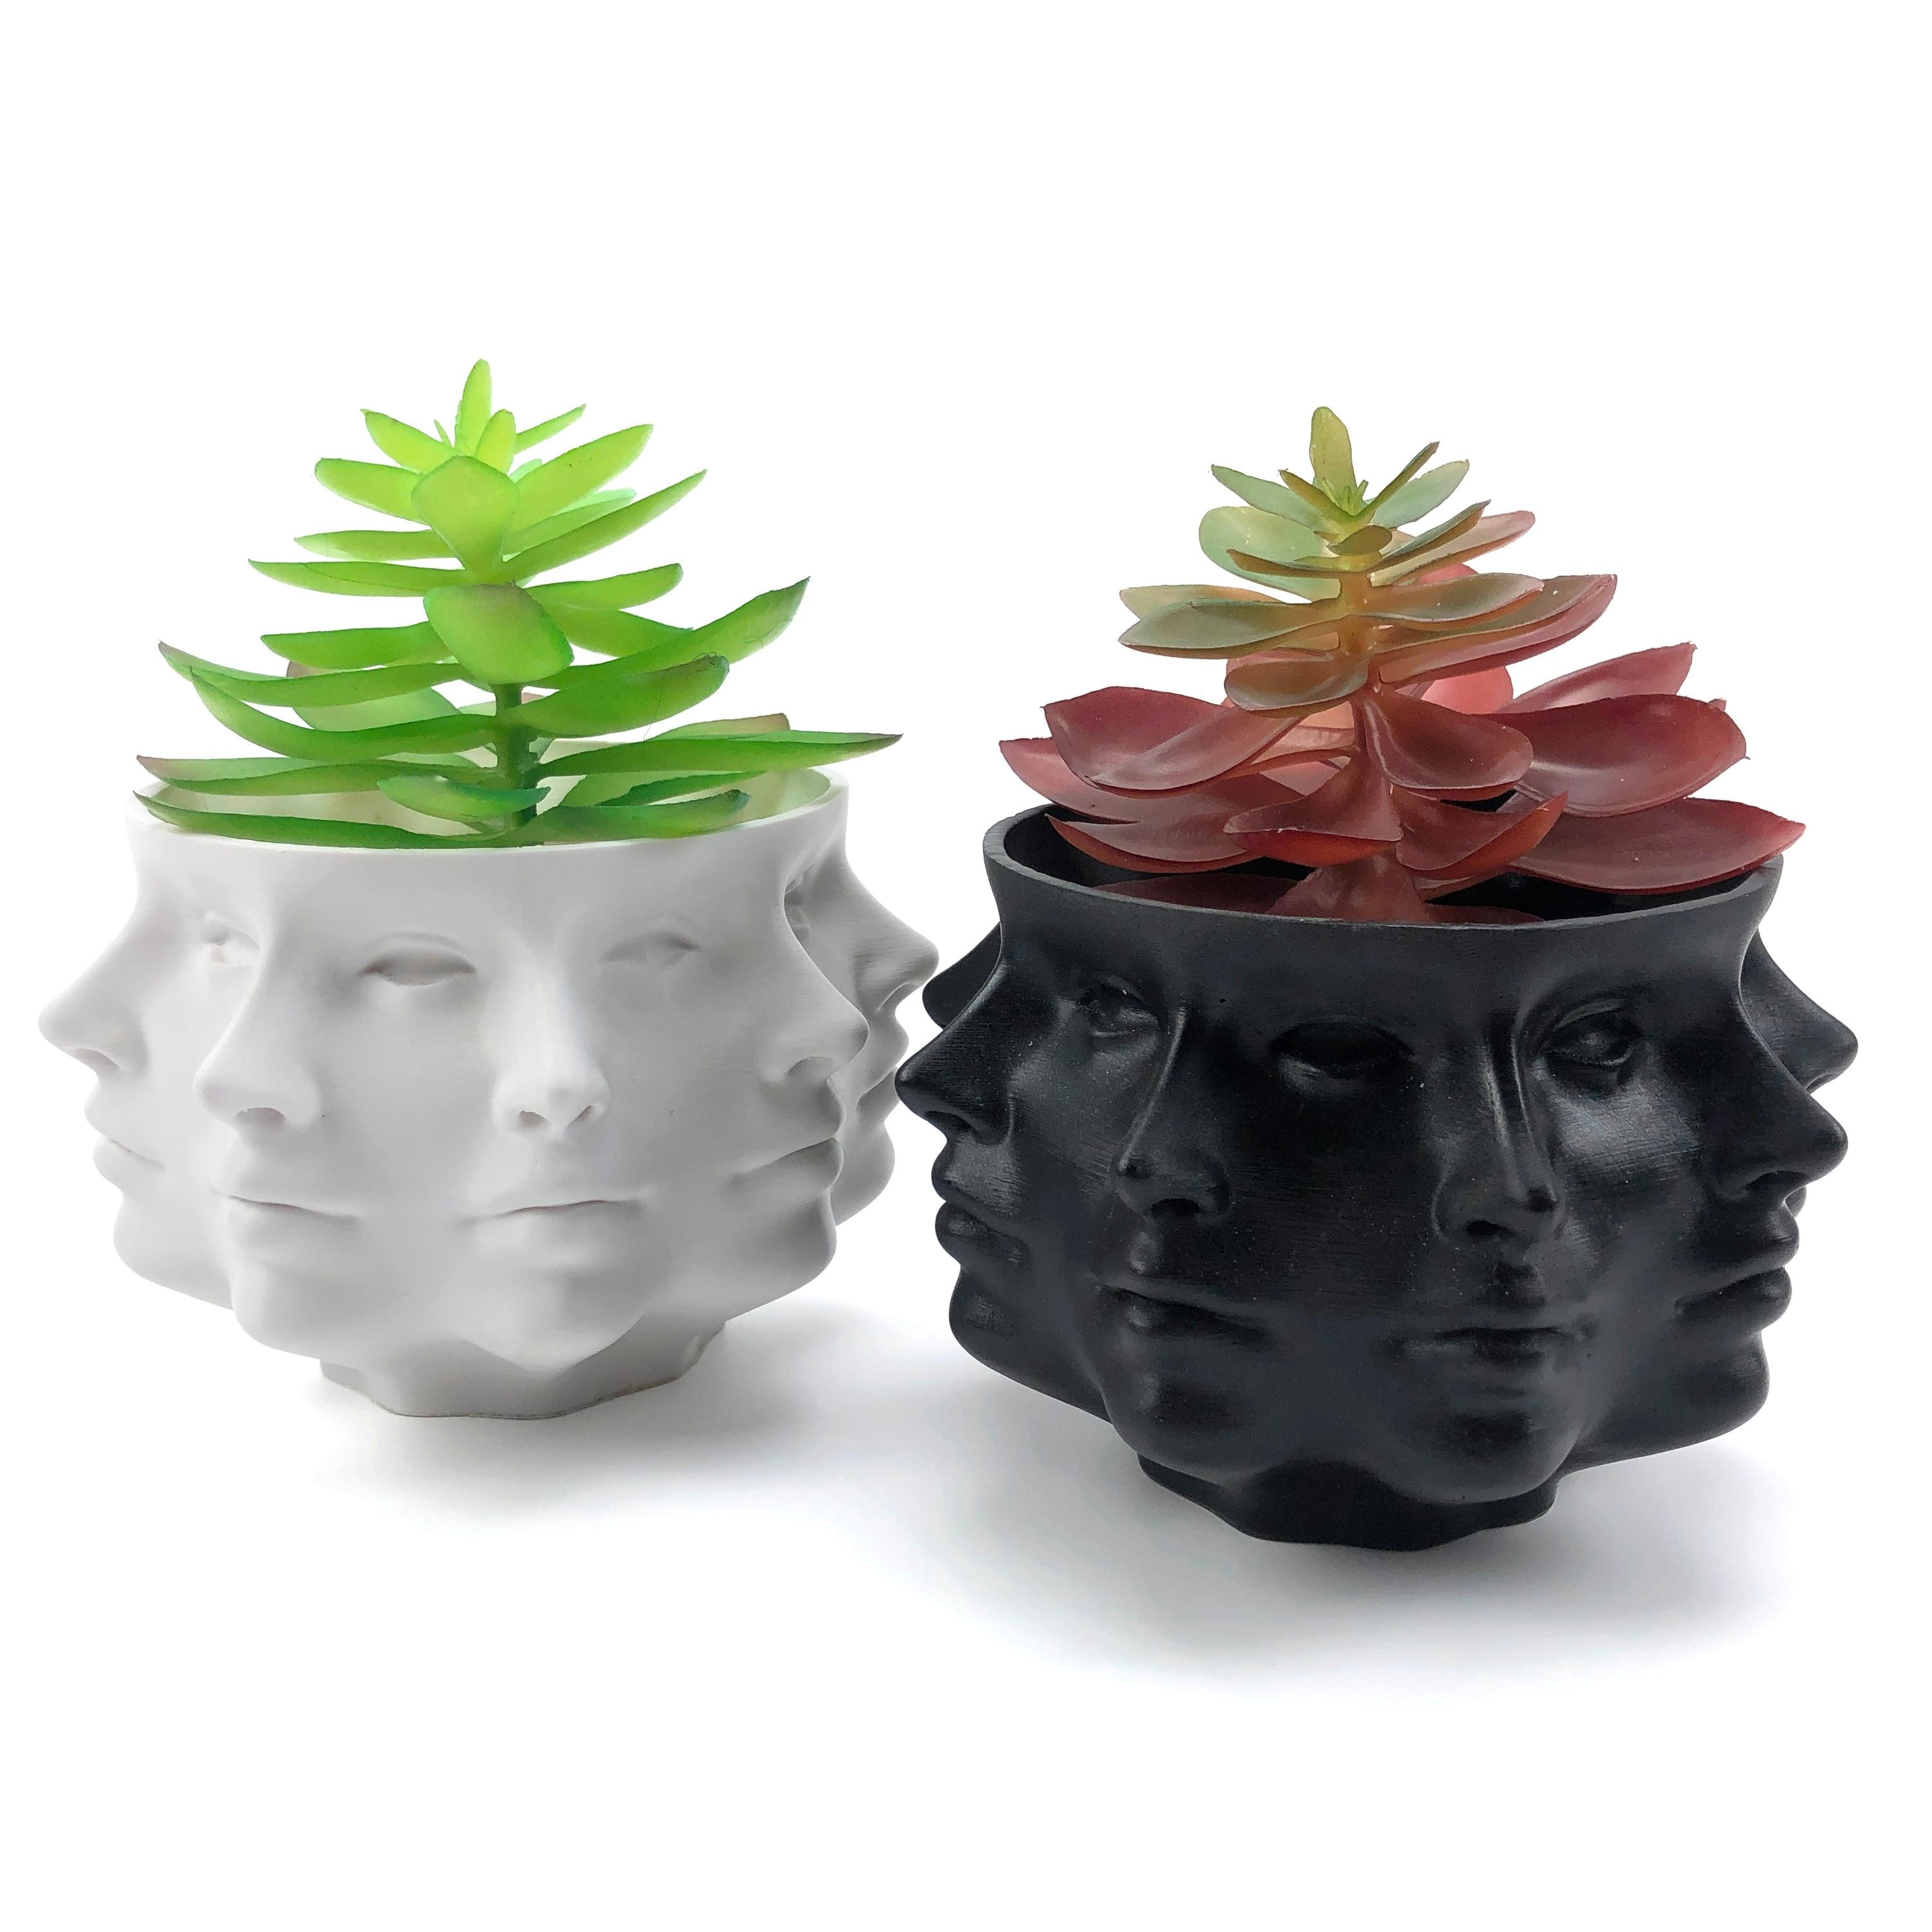 Multi-Face Succulent Planter Vase Small Face Planter Head Face Vase Home Decoration Succulent Cactus Indoor Plant Pot